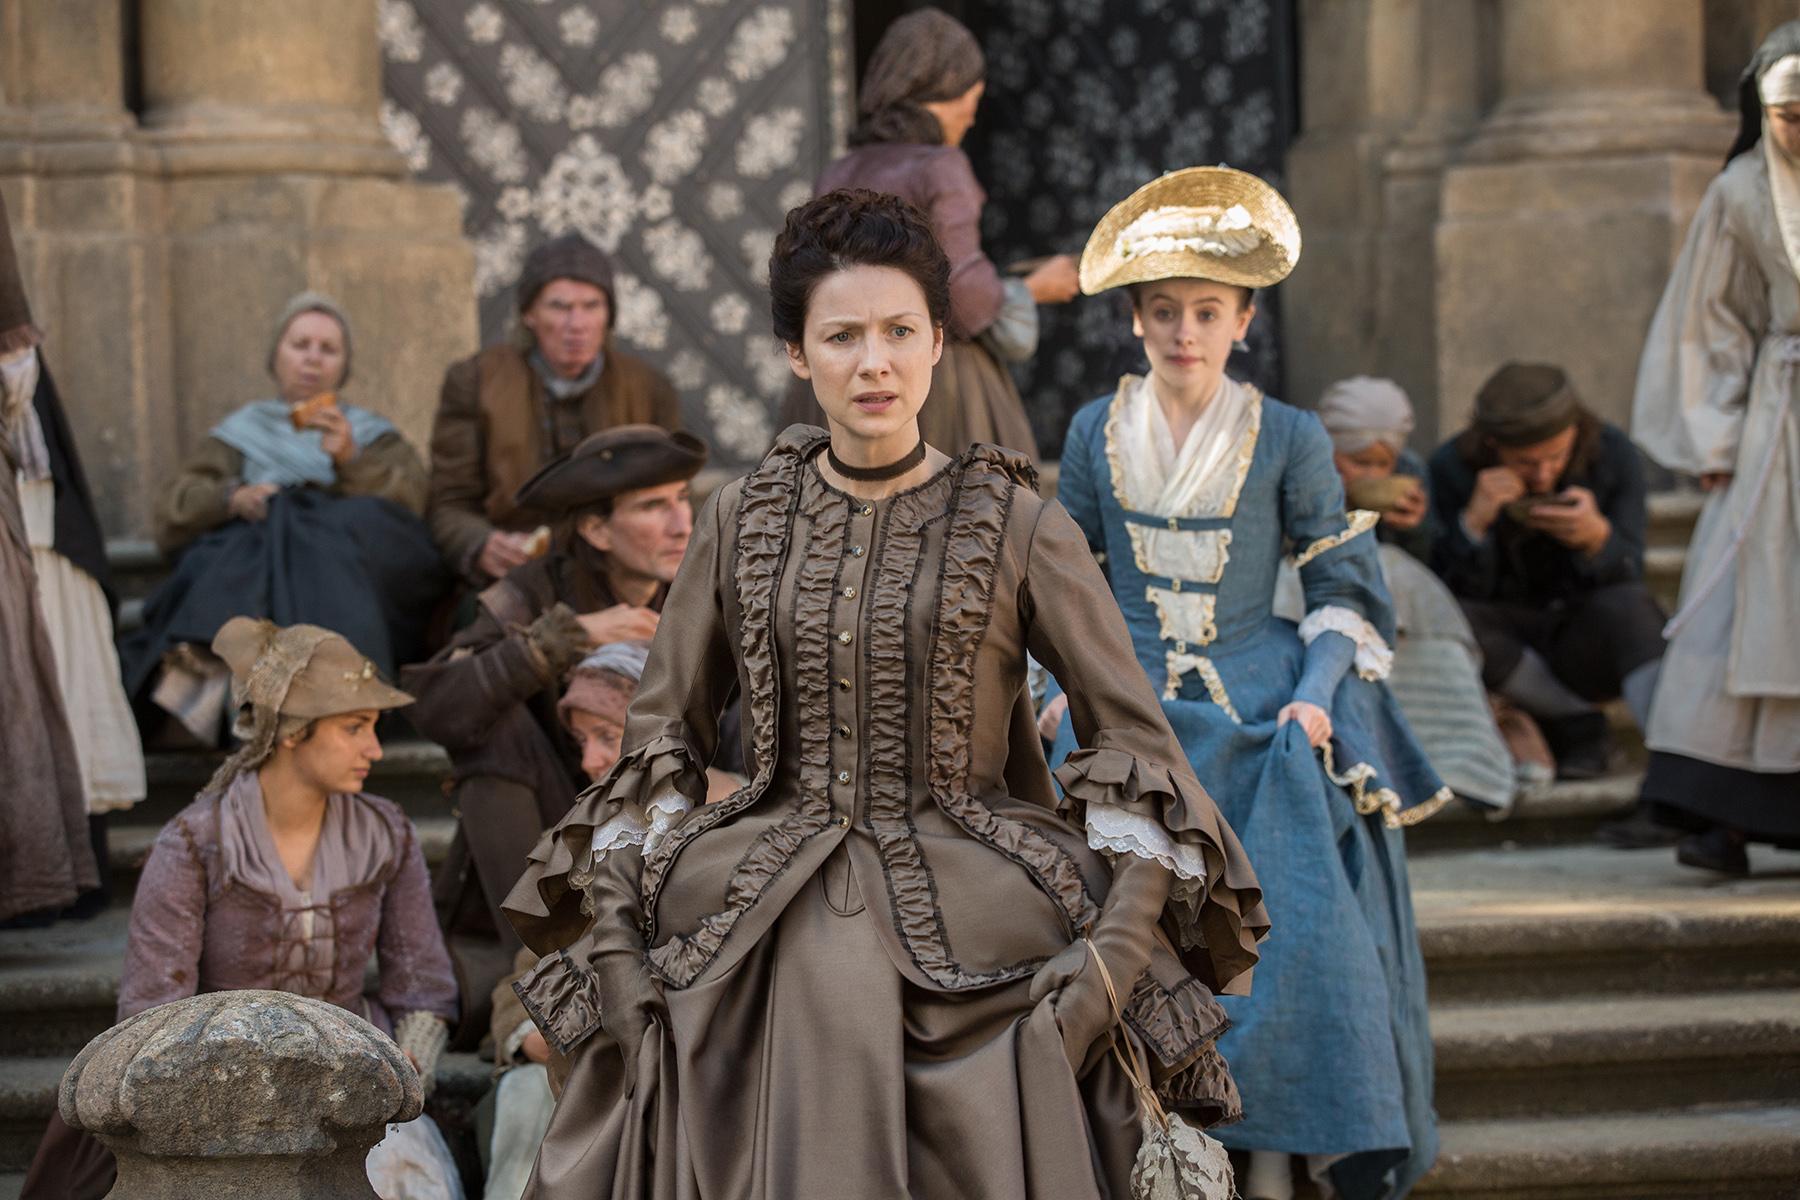 Outlander La Dame Blanche 2x04 Promotional Picture Outlander 2014 Tv Series Photo